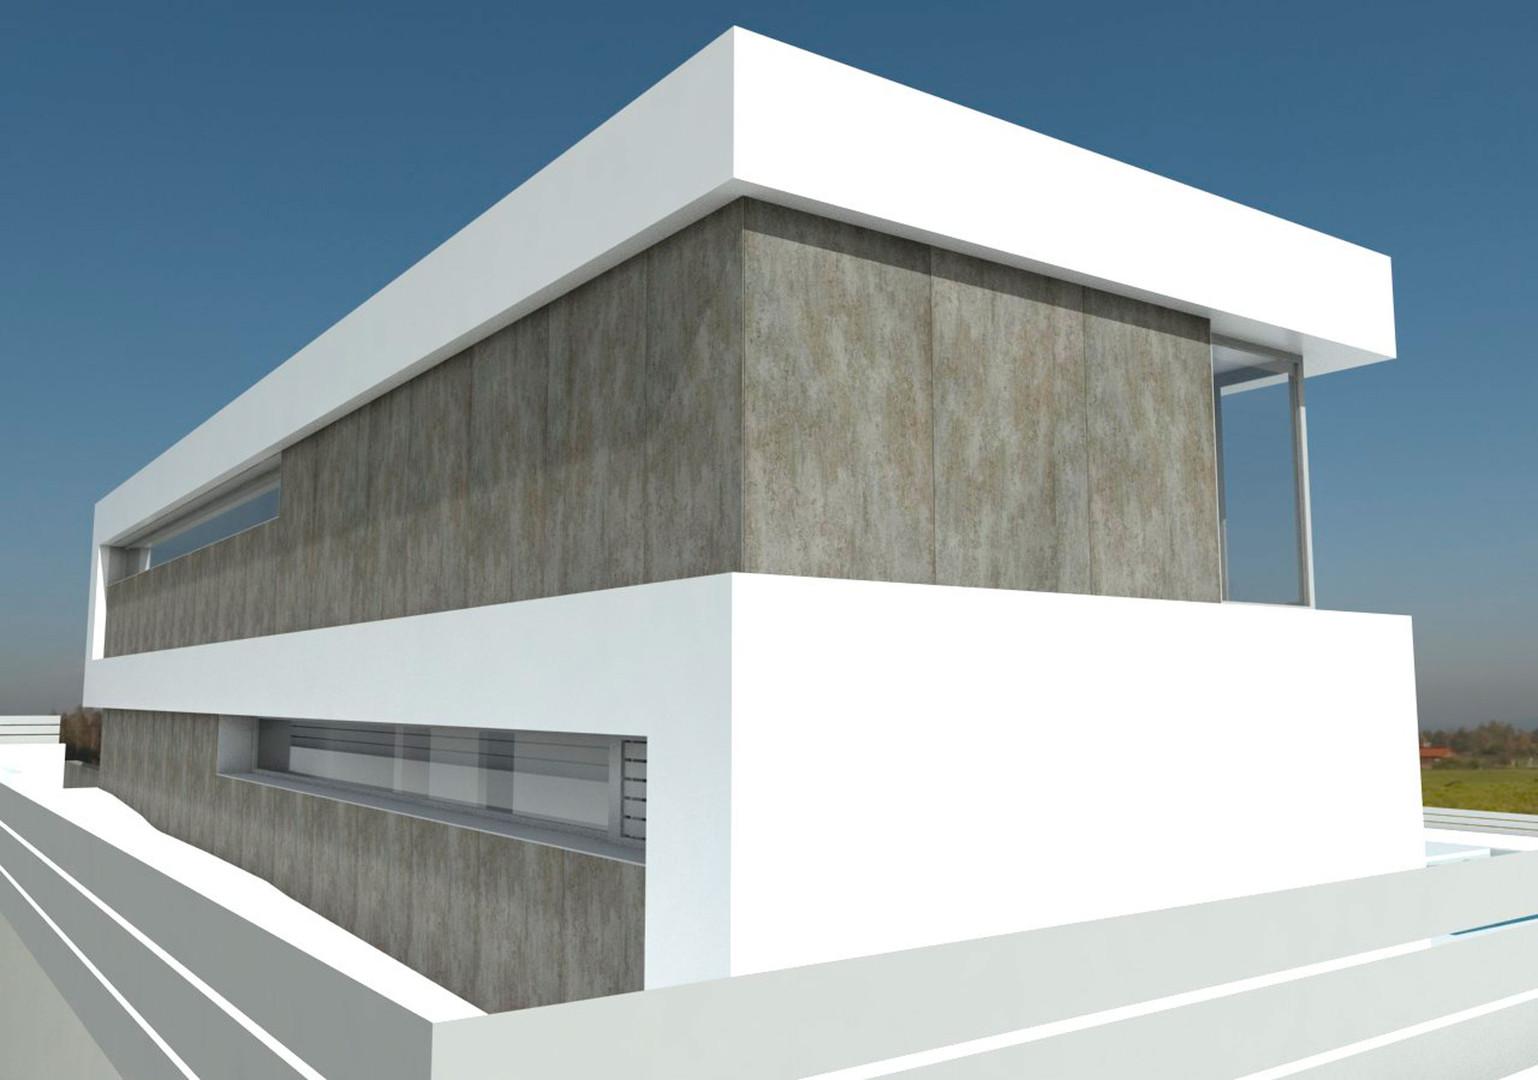 arquitectura-senmais-16.02.08.jpg